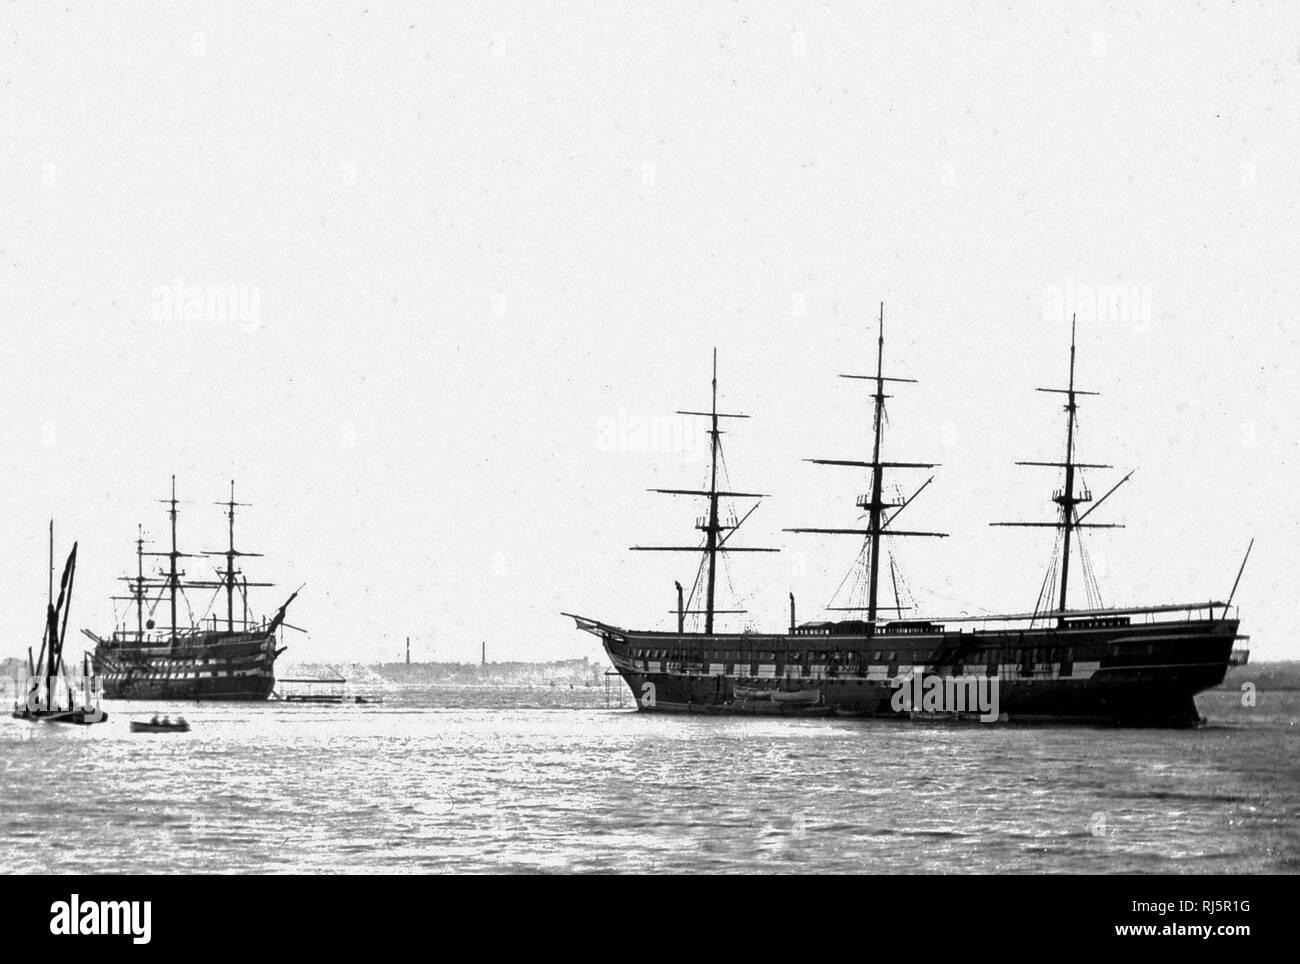 Royal Navy Training Ship HMS Shaftesbury at Grays, River Thames - Stock Image